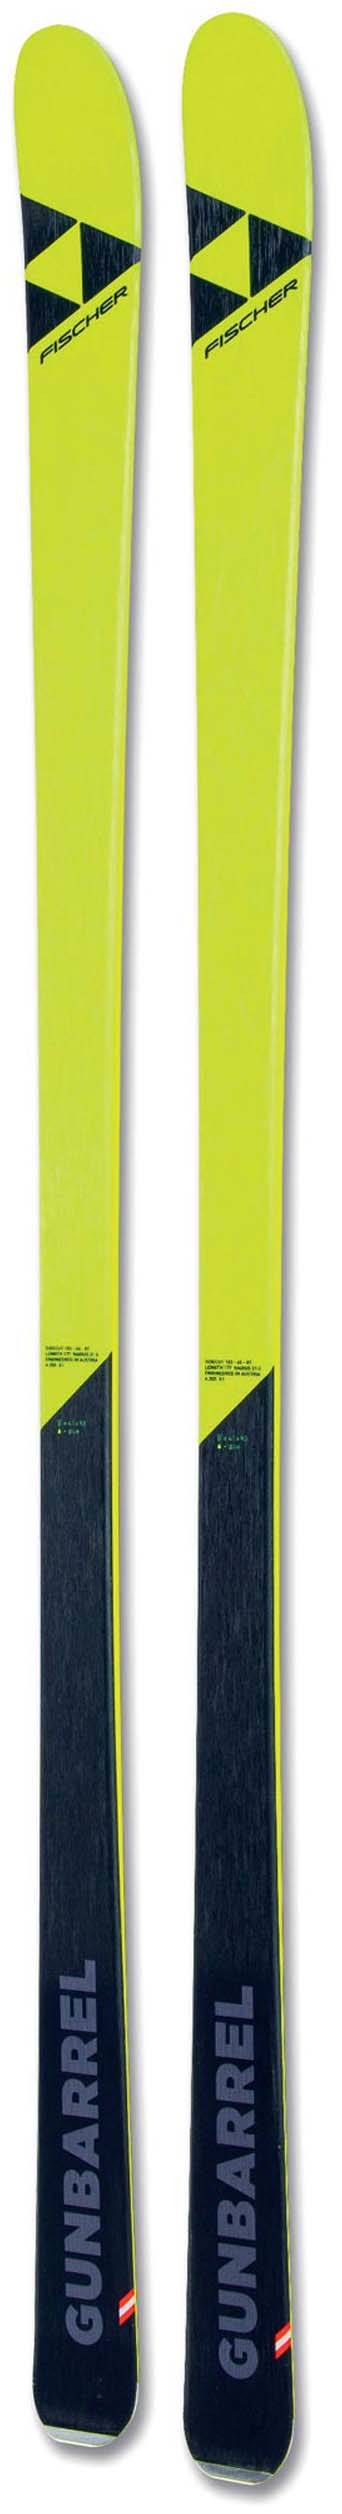 Fischer 2020 Gunbarrel Skis (No Bindings / Flat) NEW !! 163,170,177cm